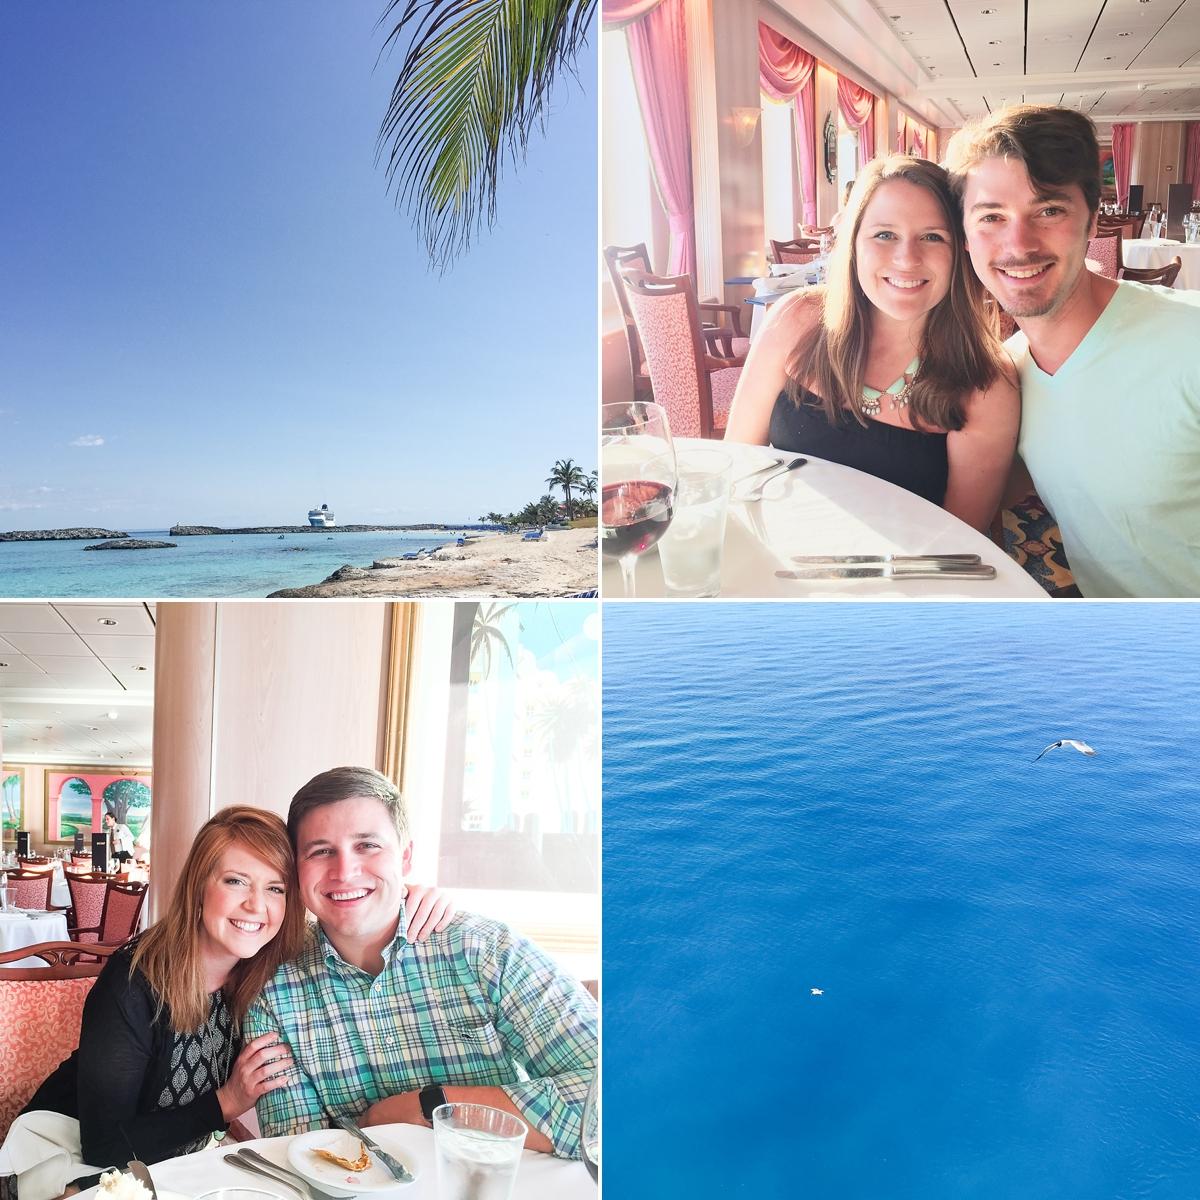 bahamas cruise vacation_0652